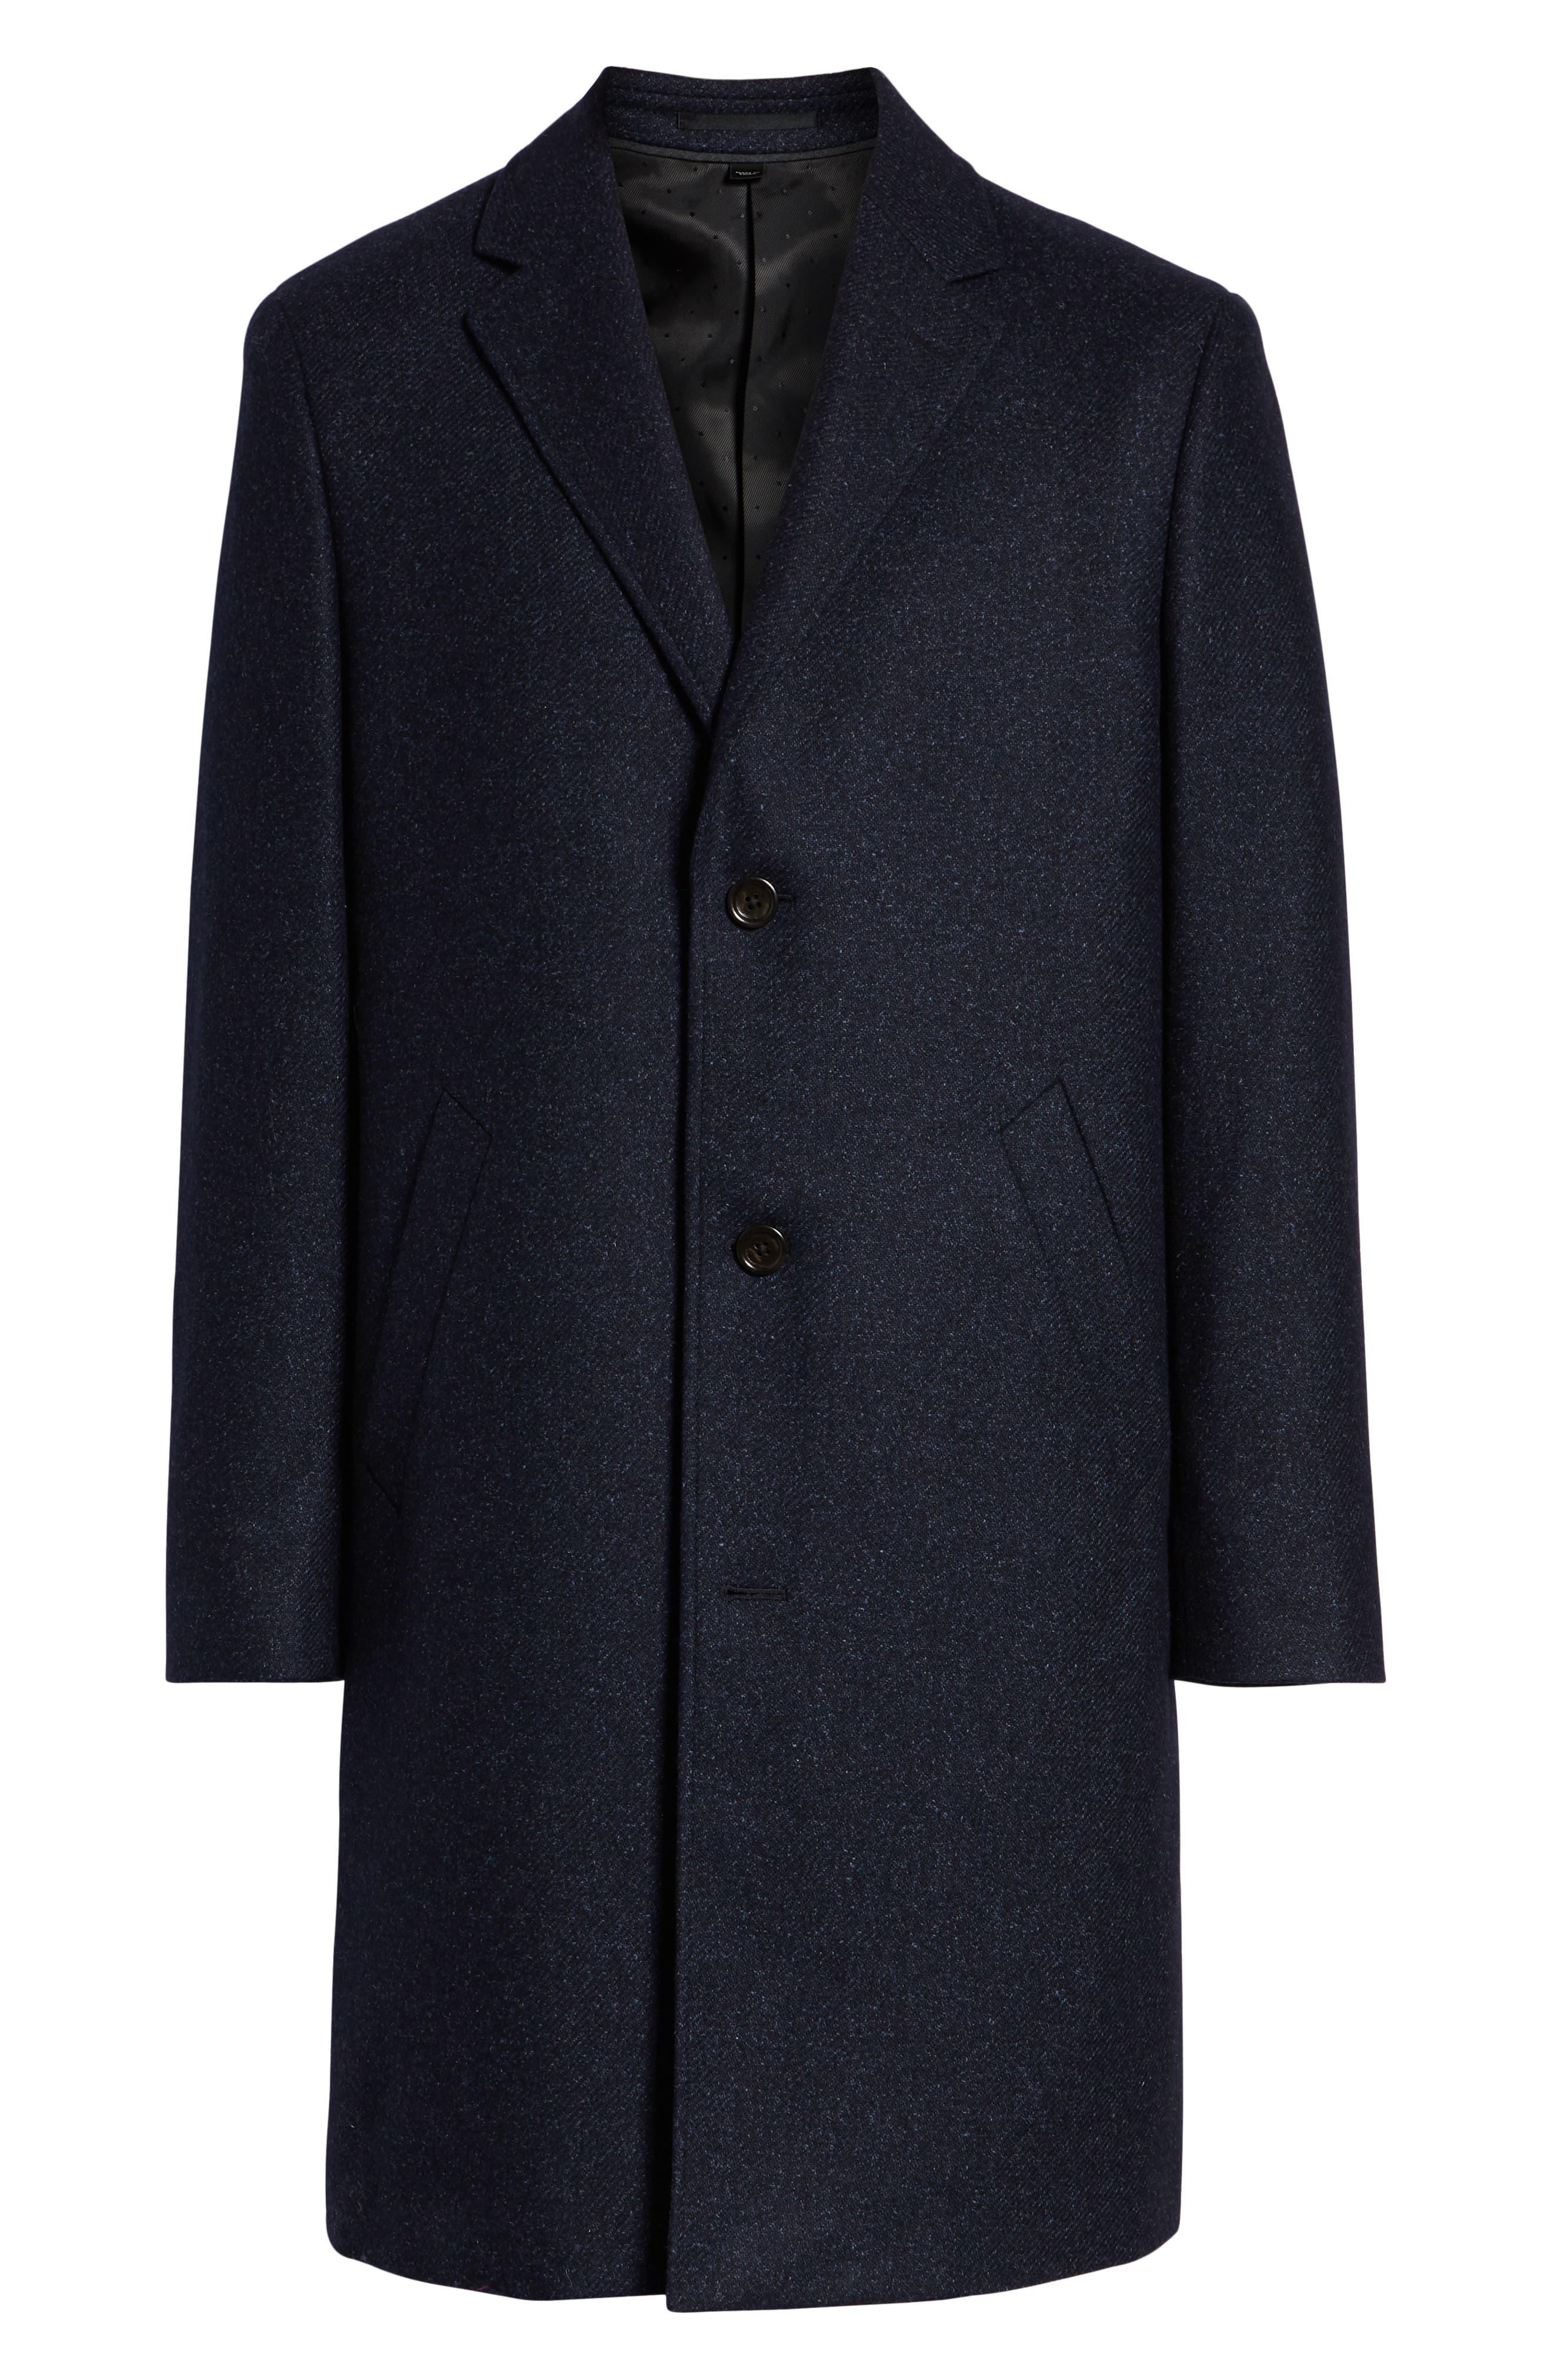 Destination Water Resistant Tweed Topcoat,                             Alternate thumbnail 6, color,                             400